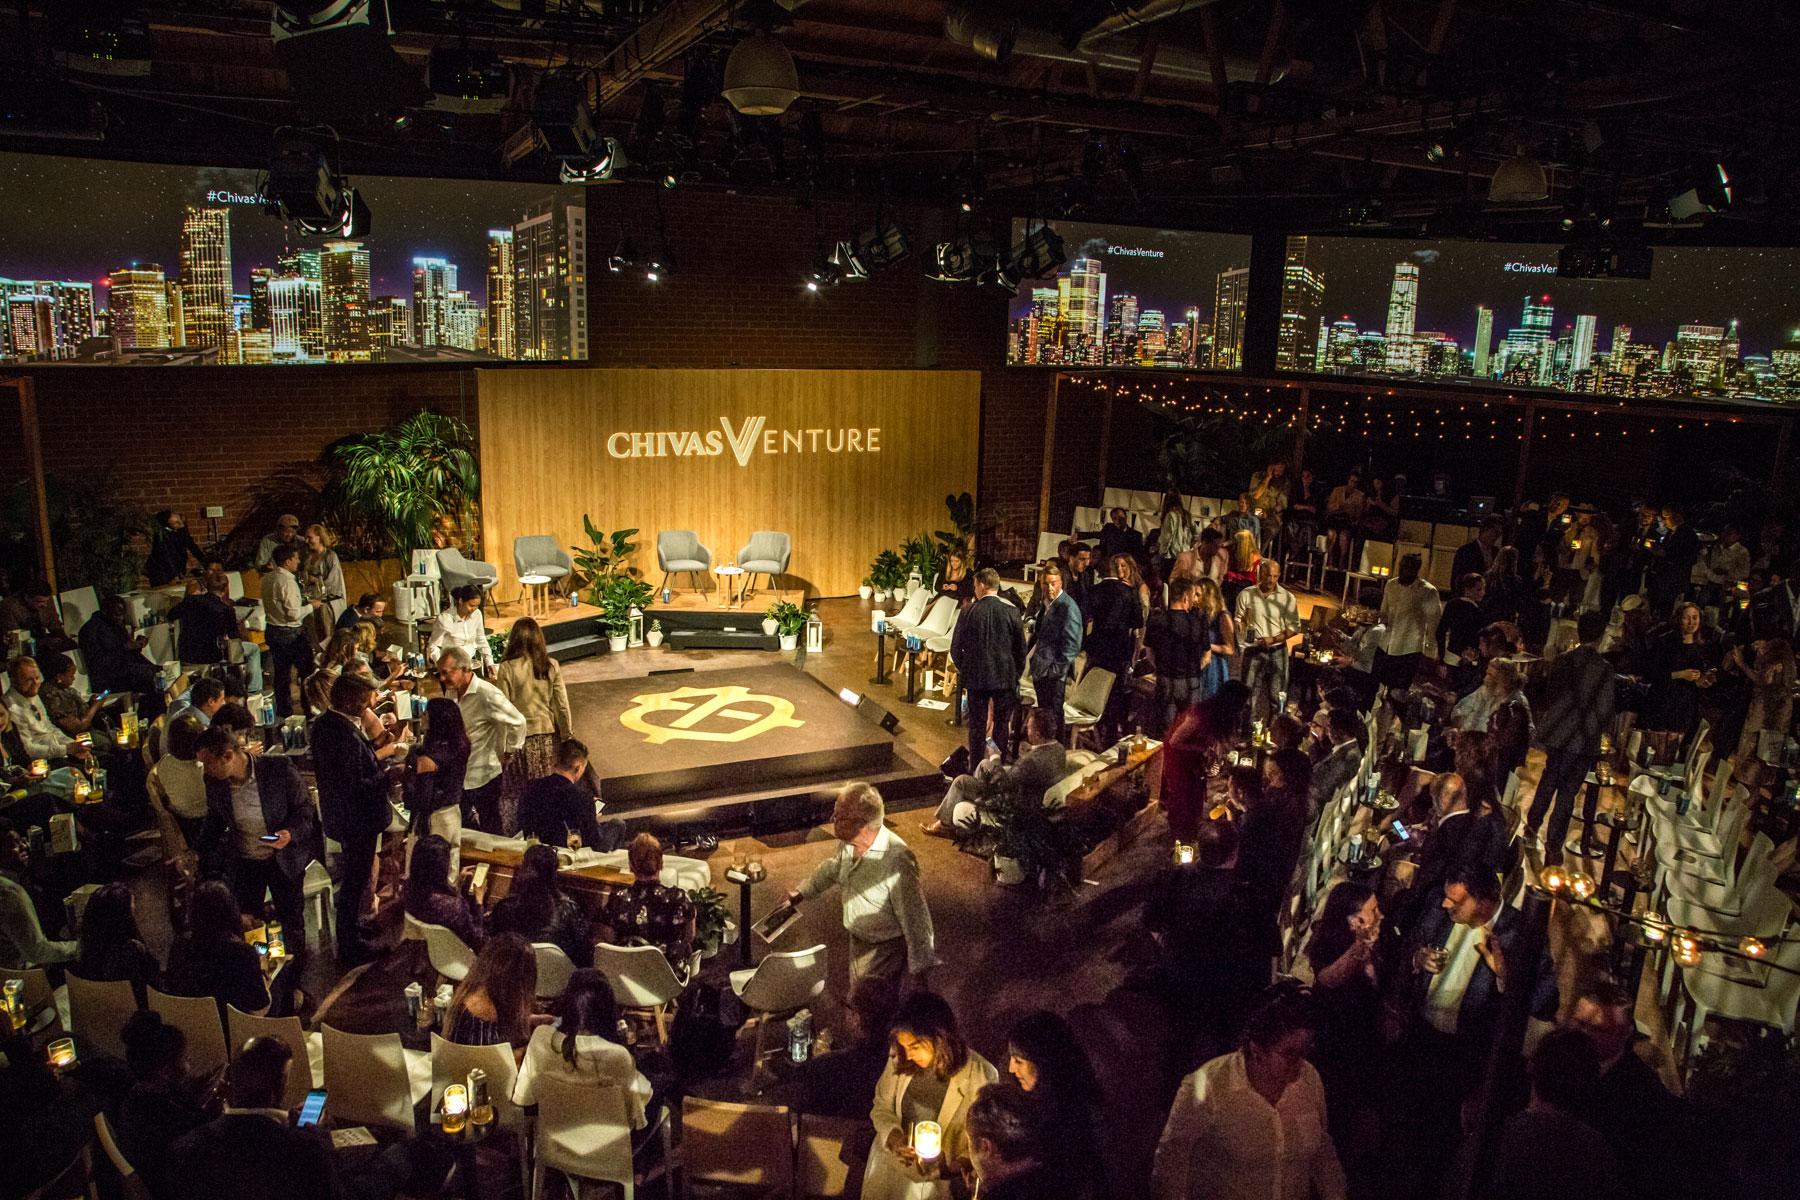 Една седмица до крайния срок за кандидатстване в международния конкурс Chivas Venture